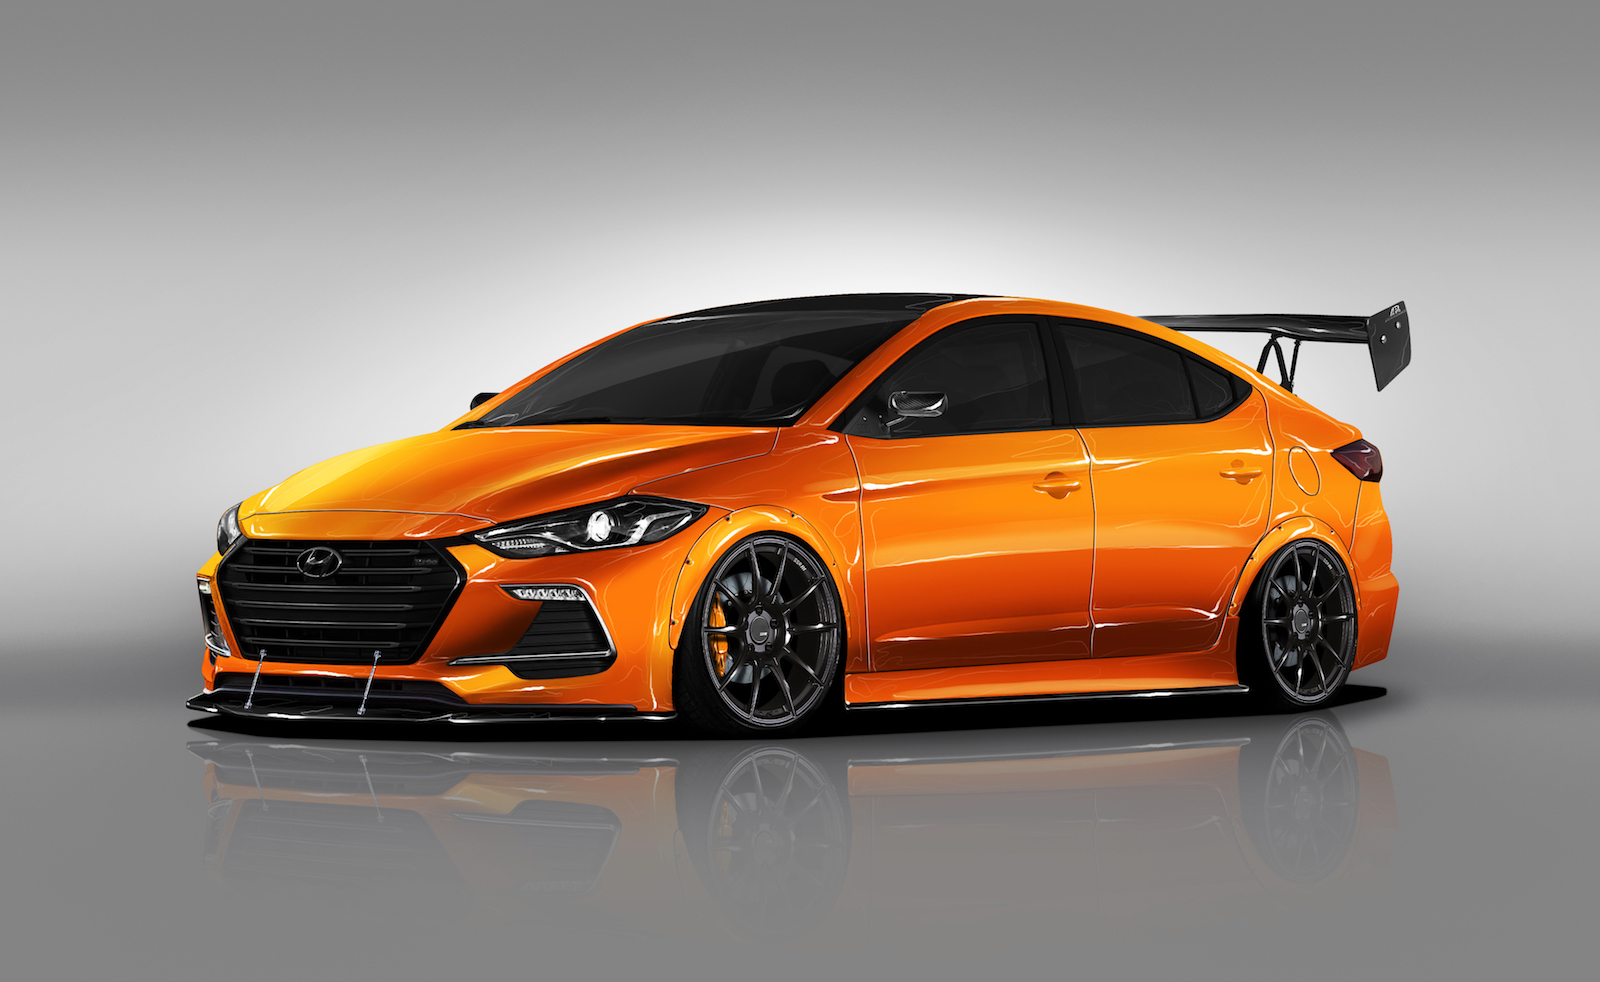 Btr Gives Hyundai Elantra Racer Look For Sema Show